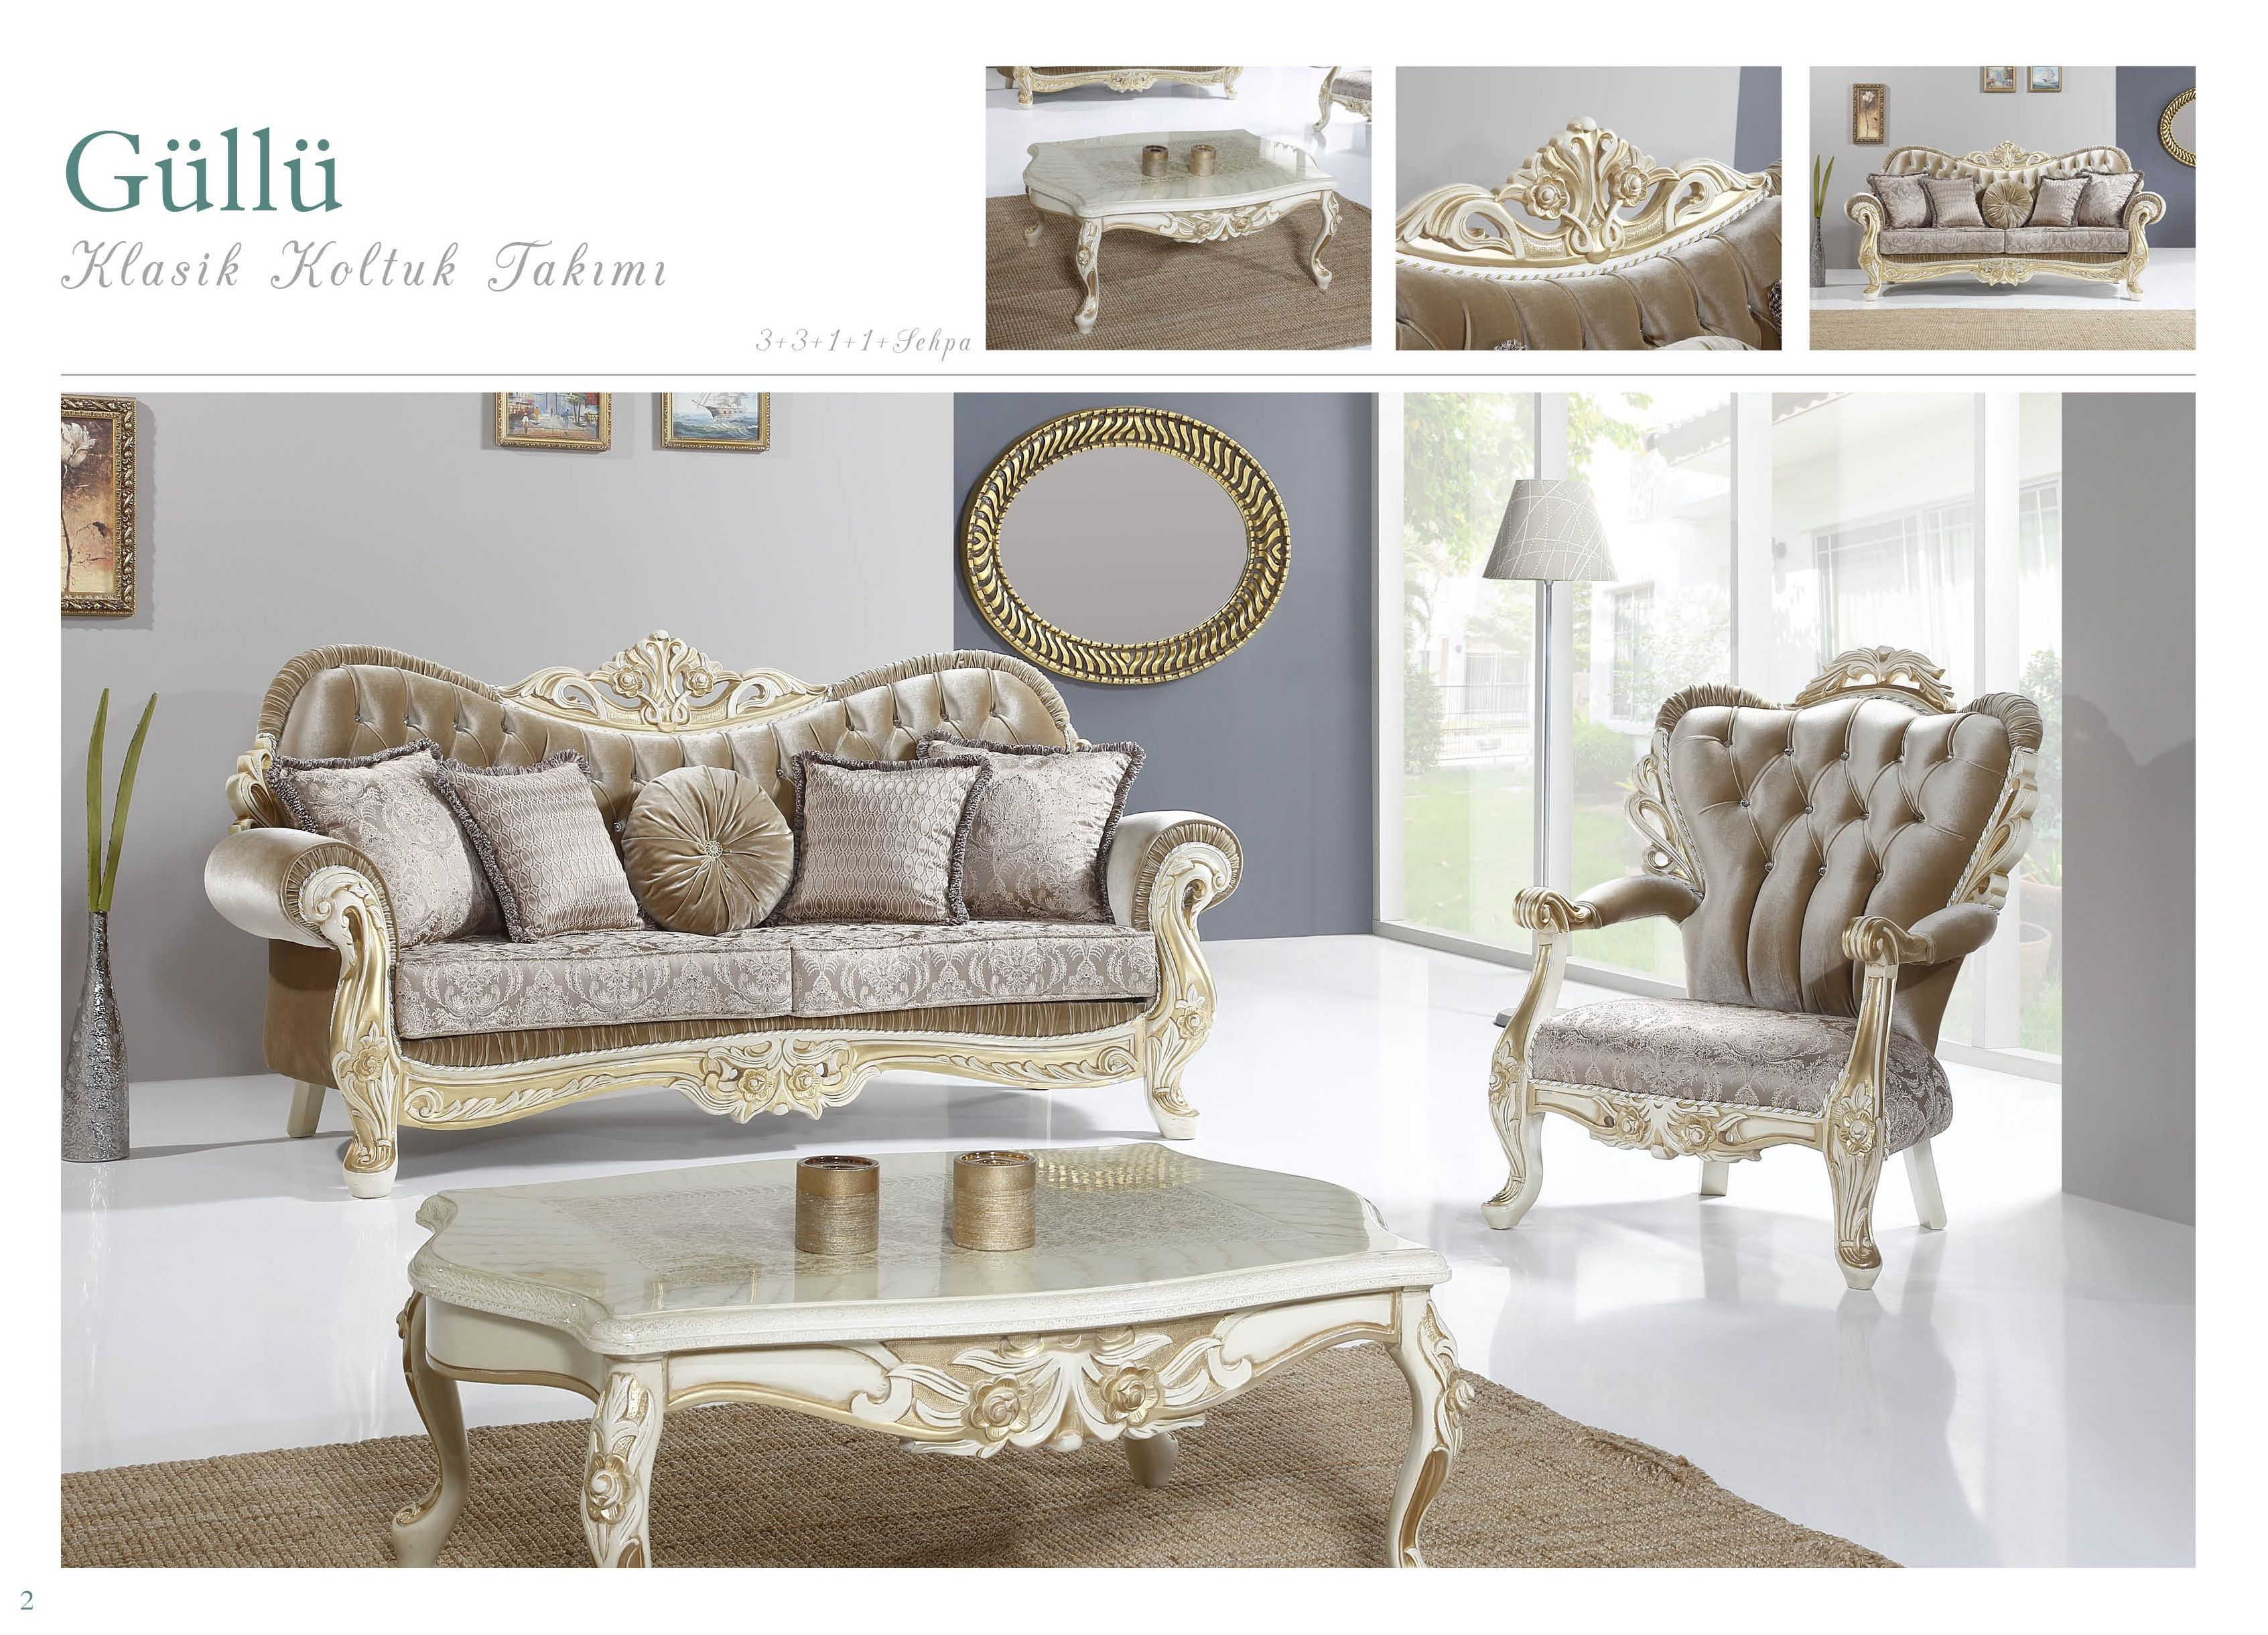 Z TVAL  En  yi Klasik Mobilya Markas  Best Classic Furniture Brand Miglior  arredo Marca Classic Beste Classic. Z TVAL  En  yi Klasik Mobilya Markas  Best Classic Furniture Brand